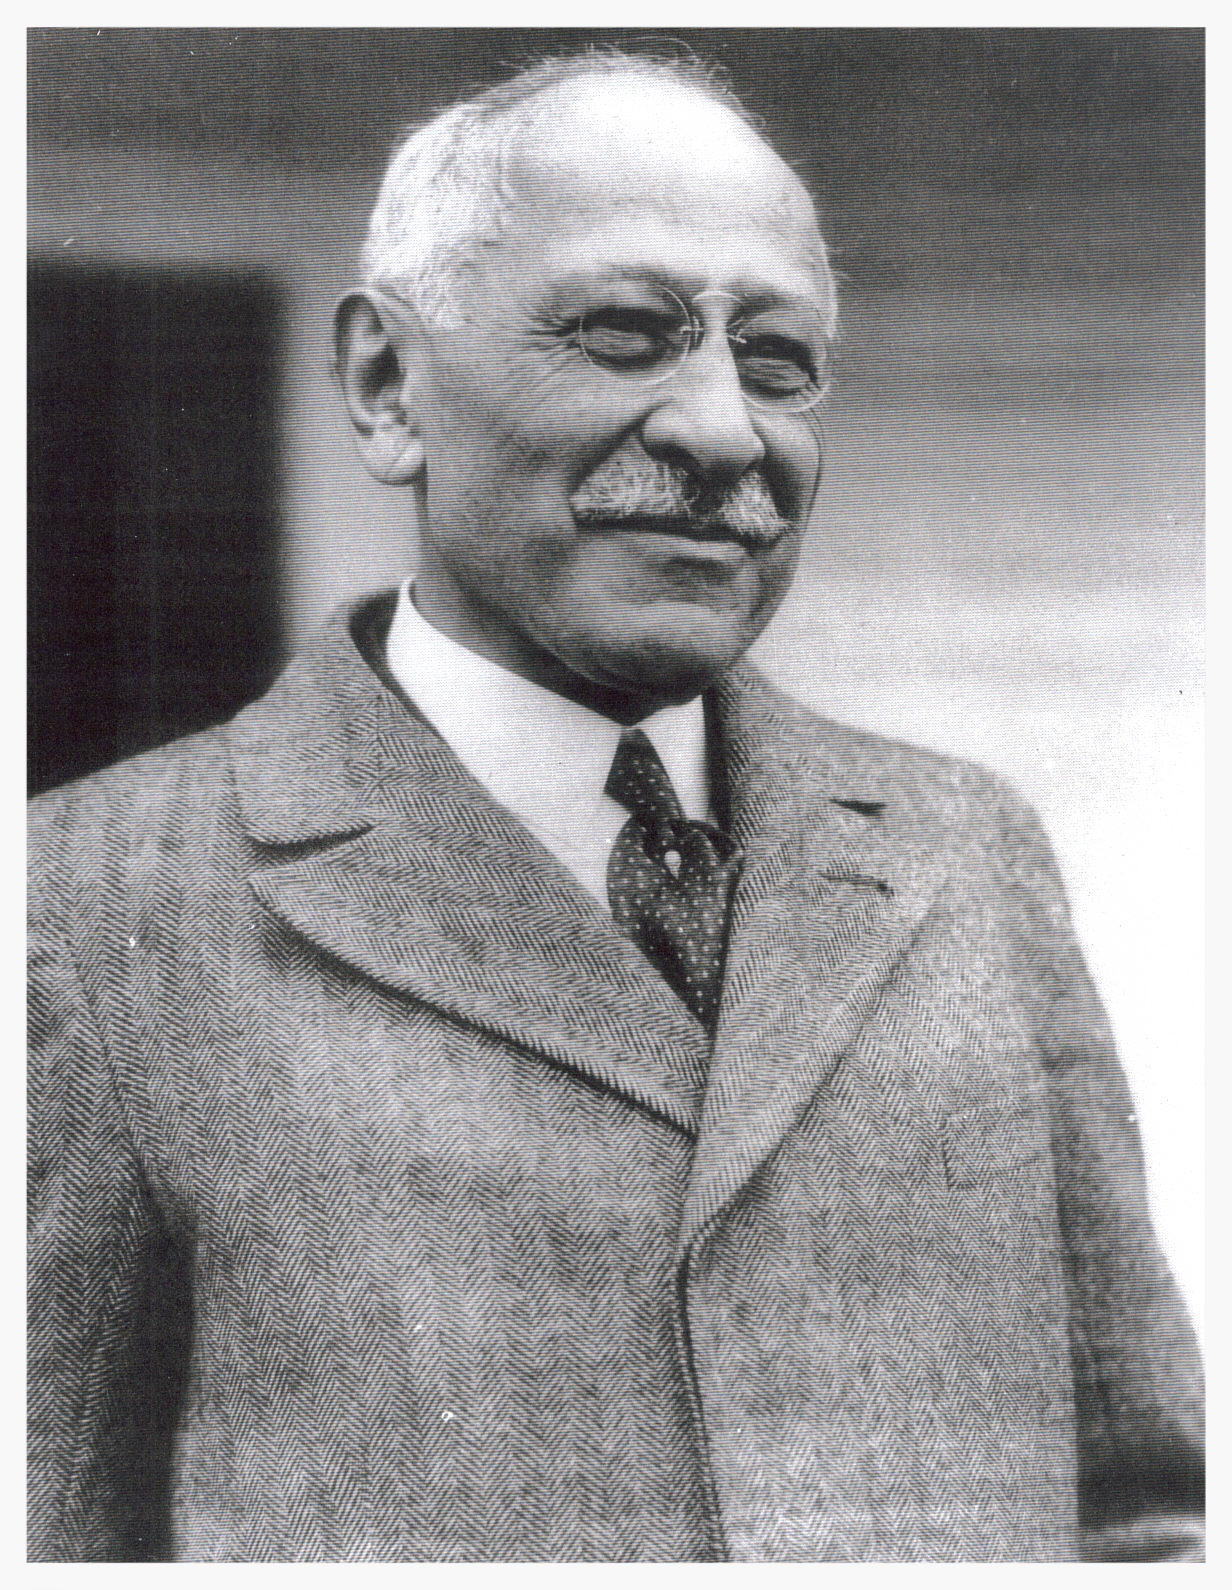 Julius Rosenwald late in life